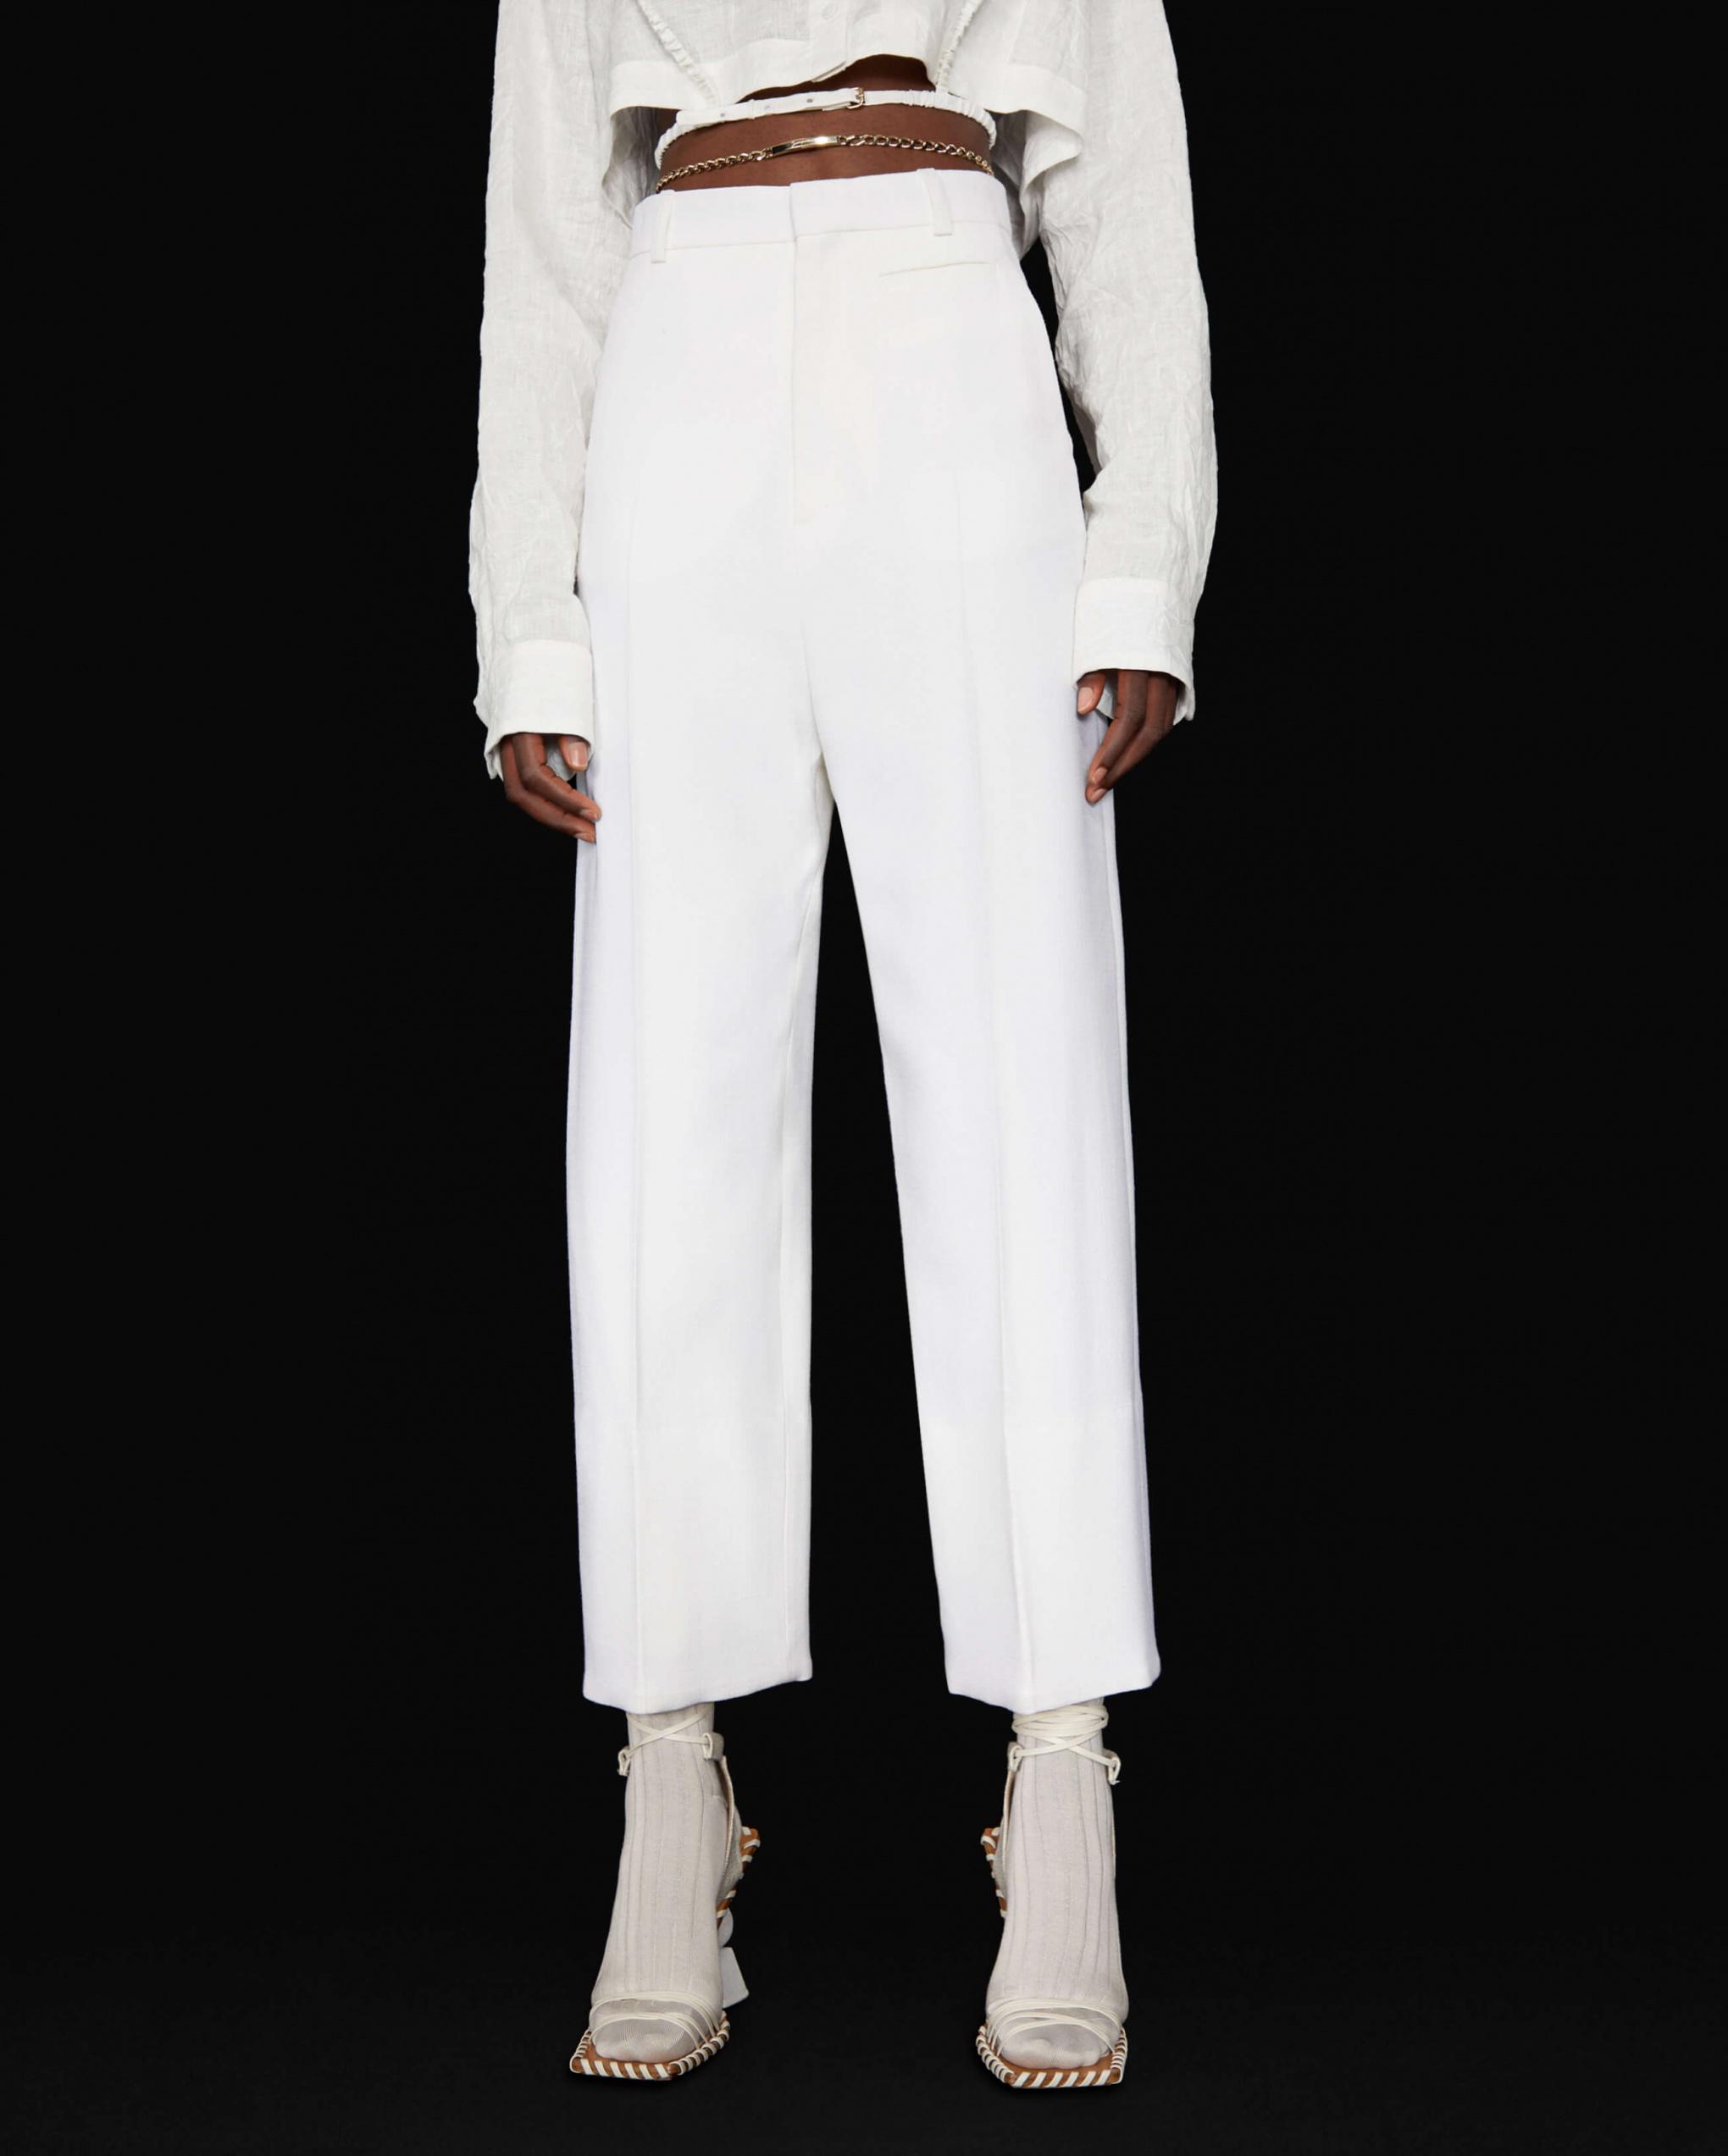 Le pantalon Santon